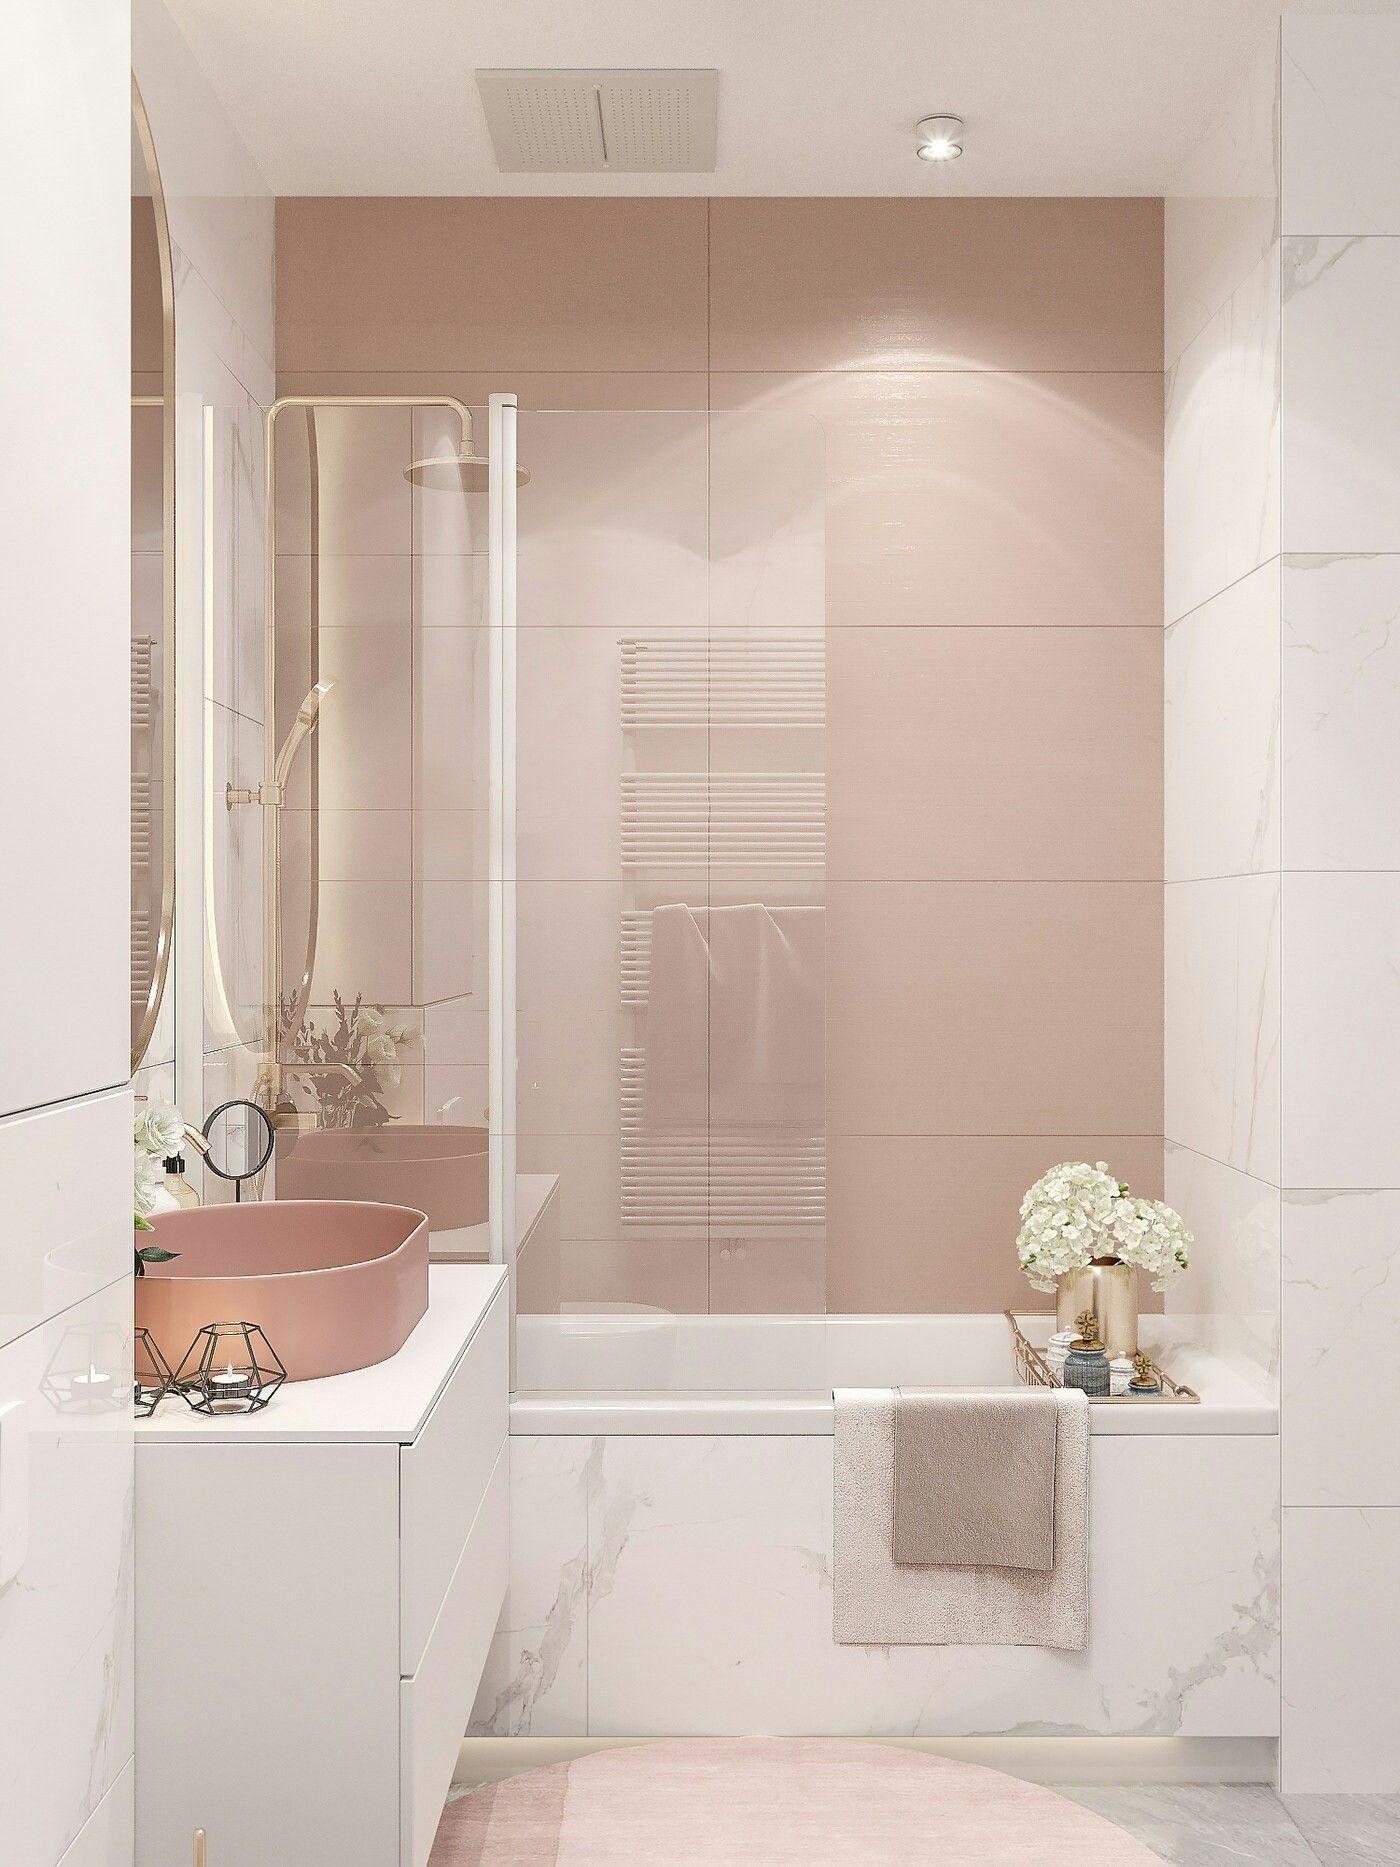 Vannaya Vannayakomnata Dom Dizajn Dizajnvannoj Interer Home House Bathroom Design I Bathroom Design Luxury Bathroom Interior Design Bathroom Interior Feminine bathroom decorating ideas